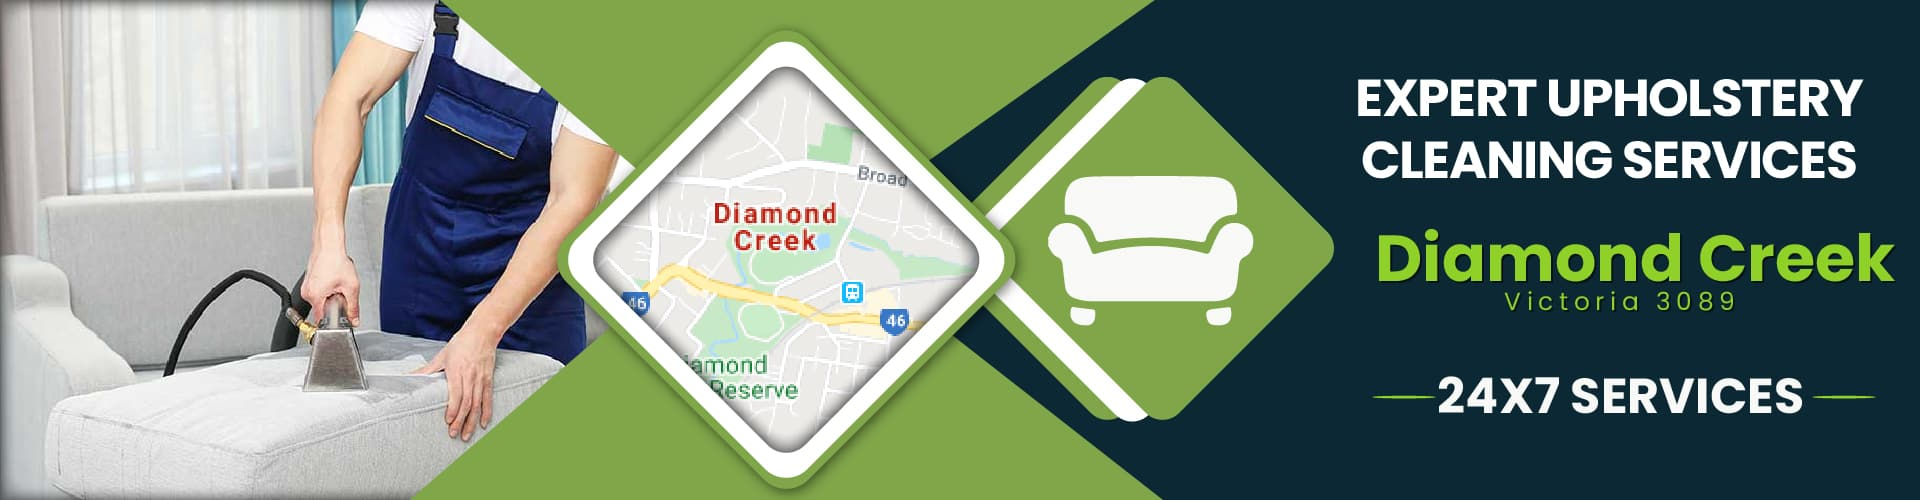 Upholstery Cleaning Diamond Creek